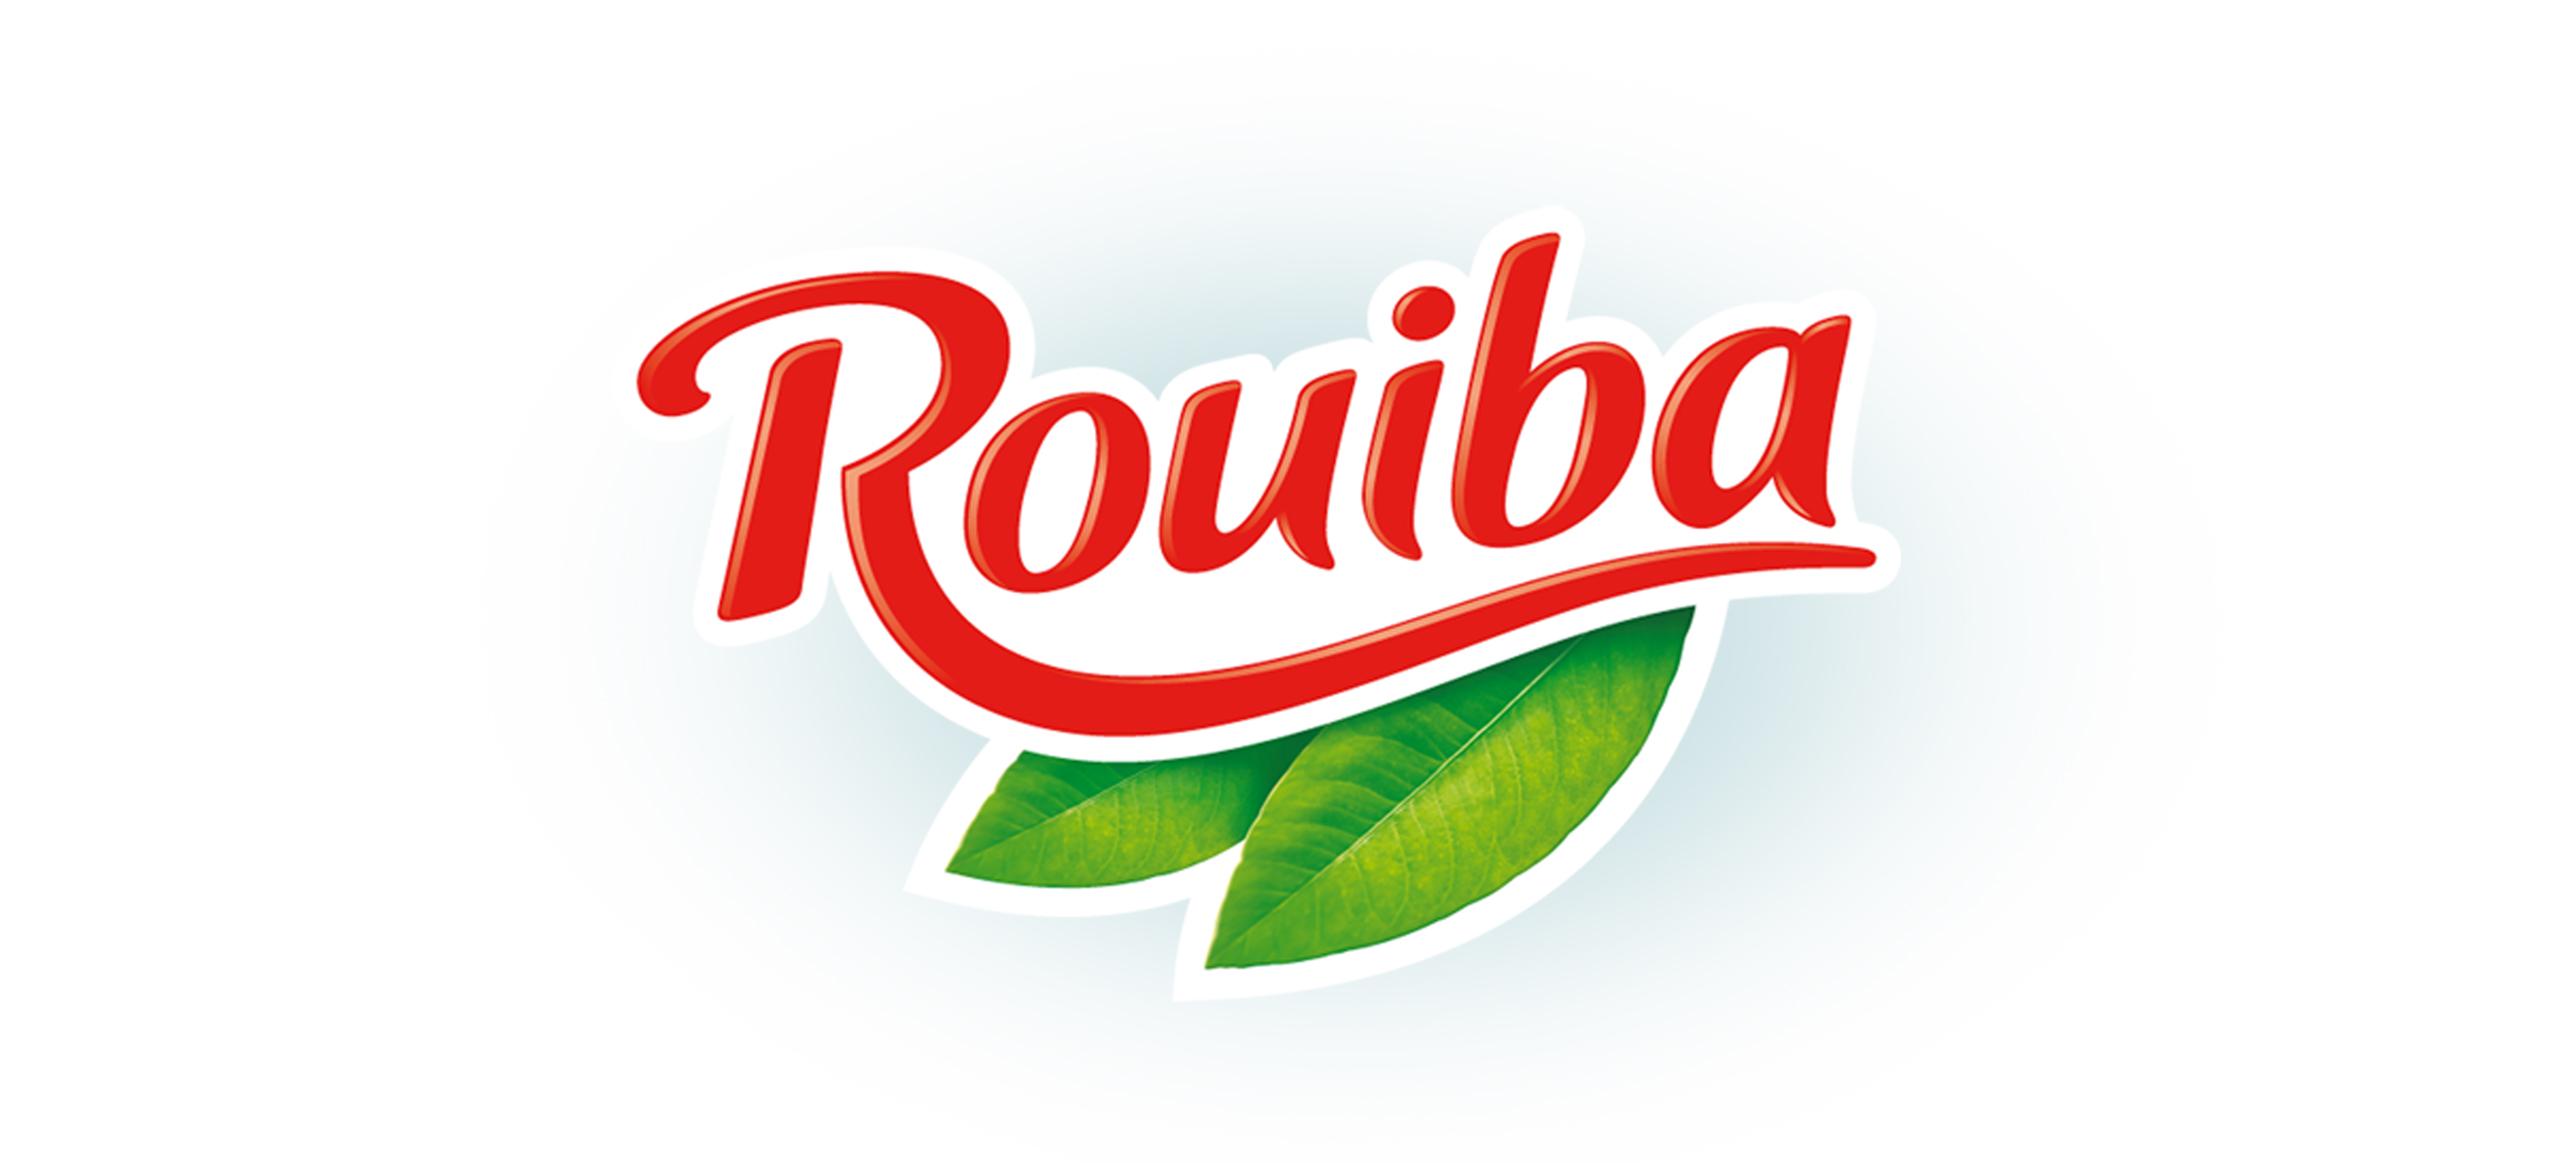 rouiba logo Vikiu design